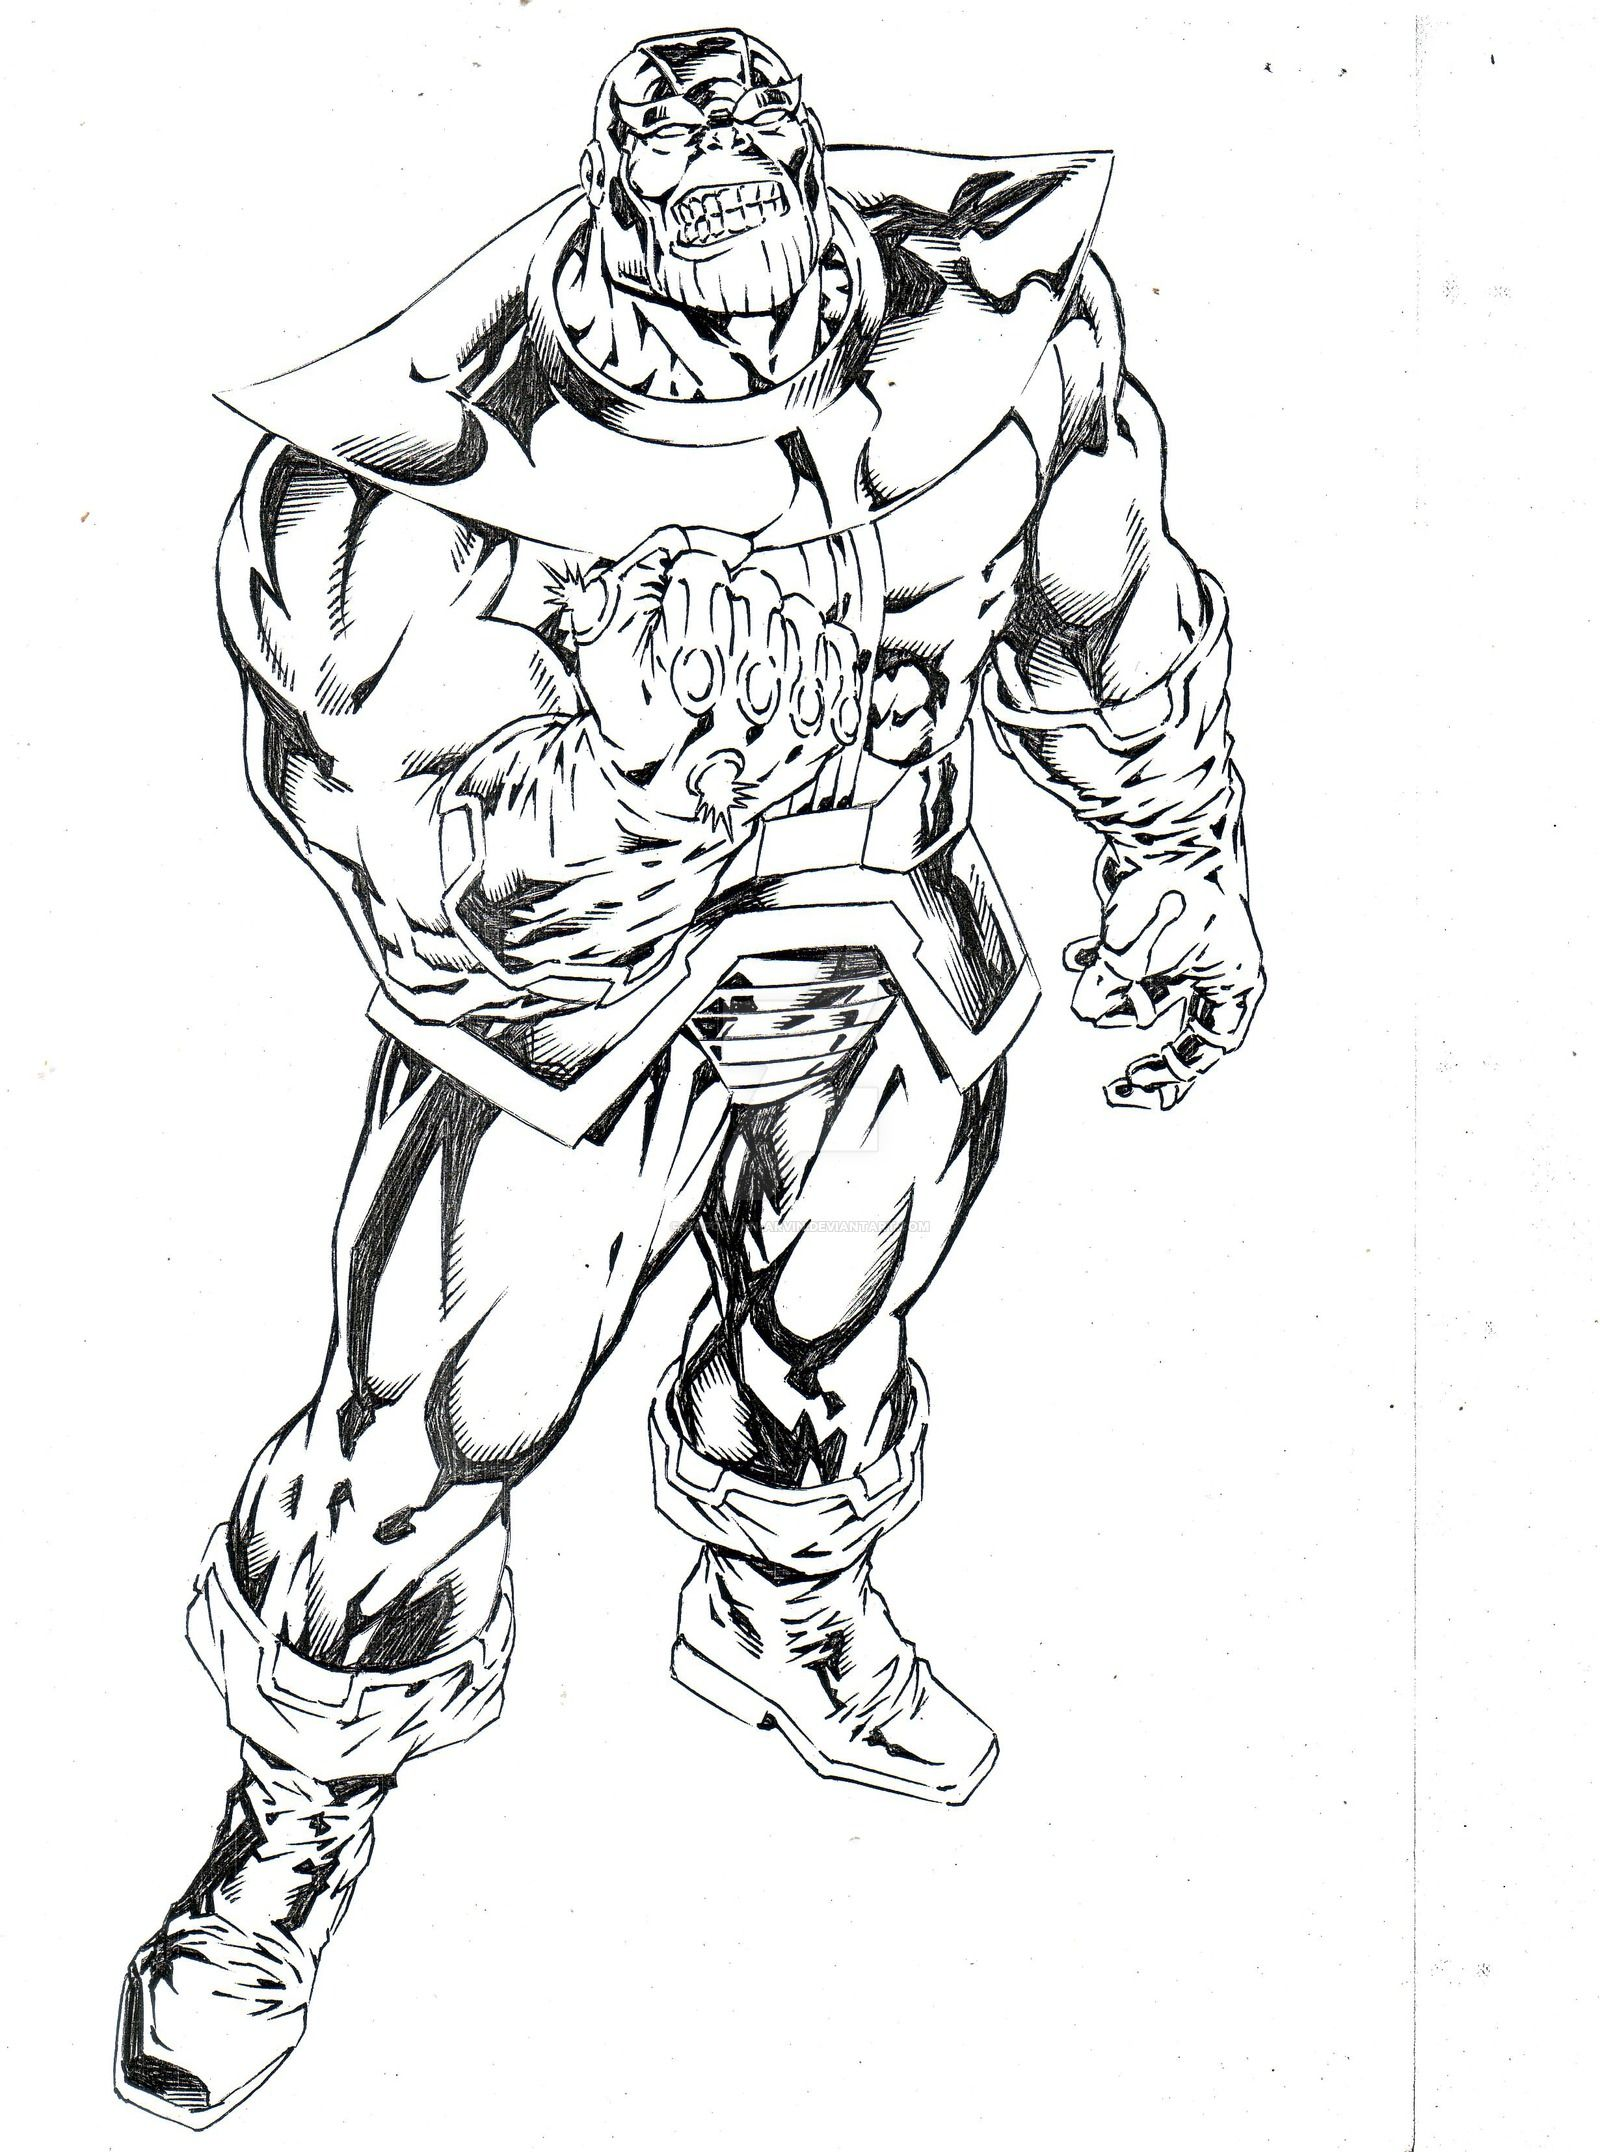 THANOS By Capocyan-Arvin On DeviantArt   LineArt Thanos   Pinterest   DeviantART And Marvel